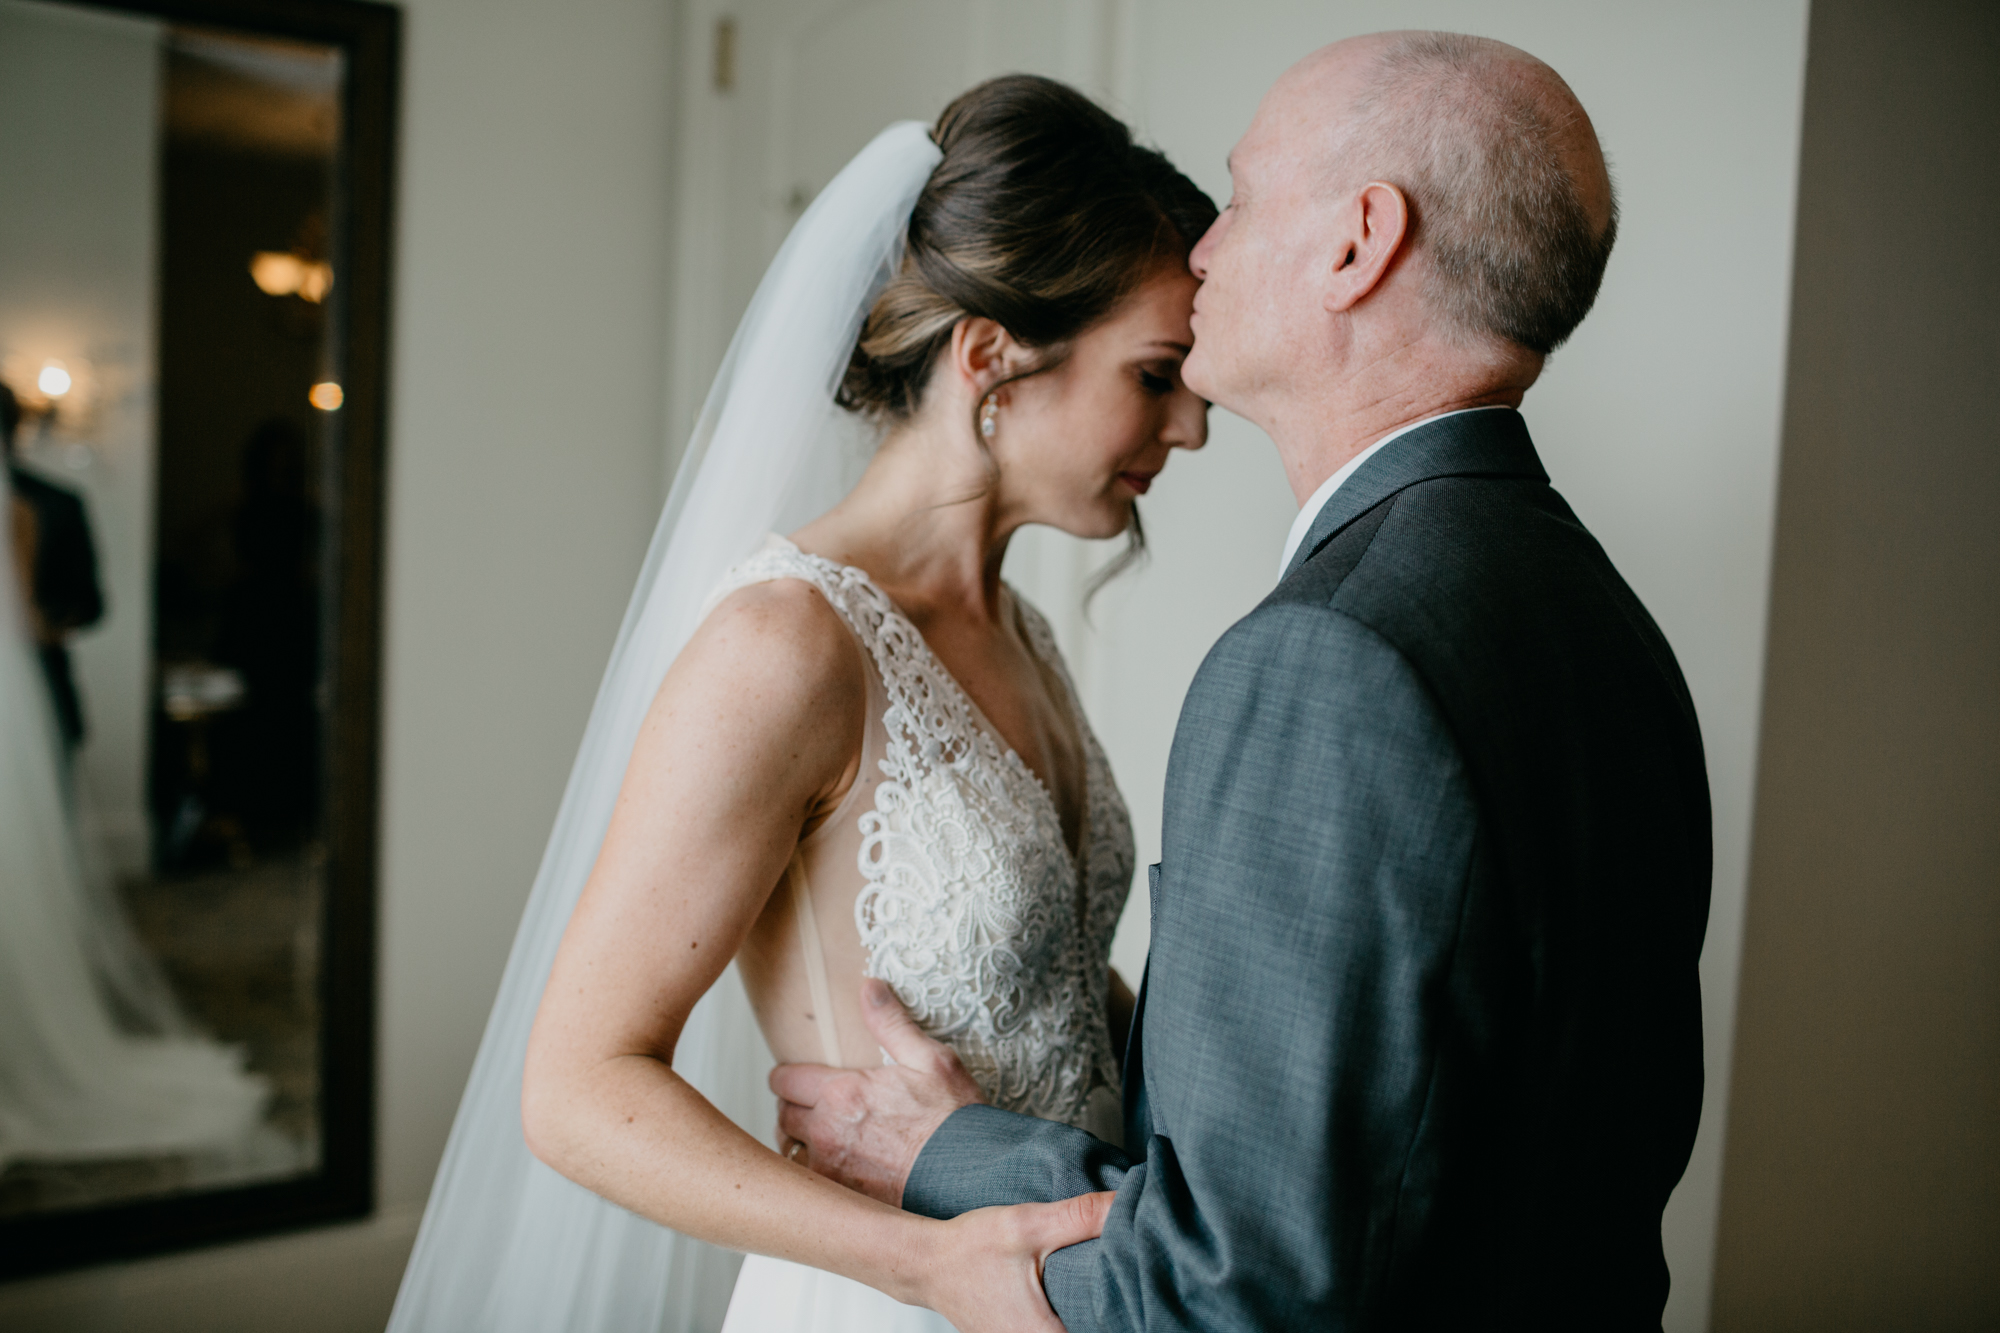 Jaclyn_Andrew_quincy_massachusetts_wedding005.jpg